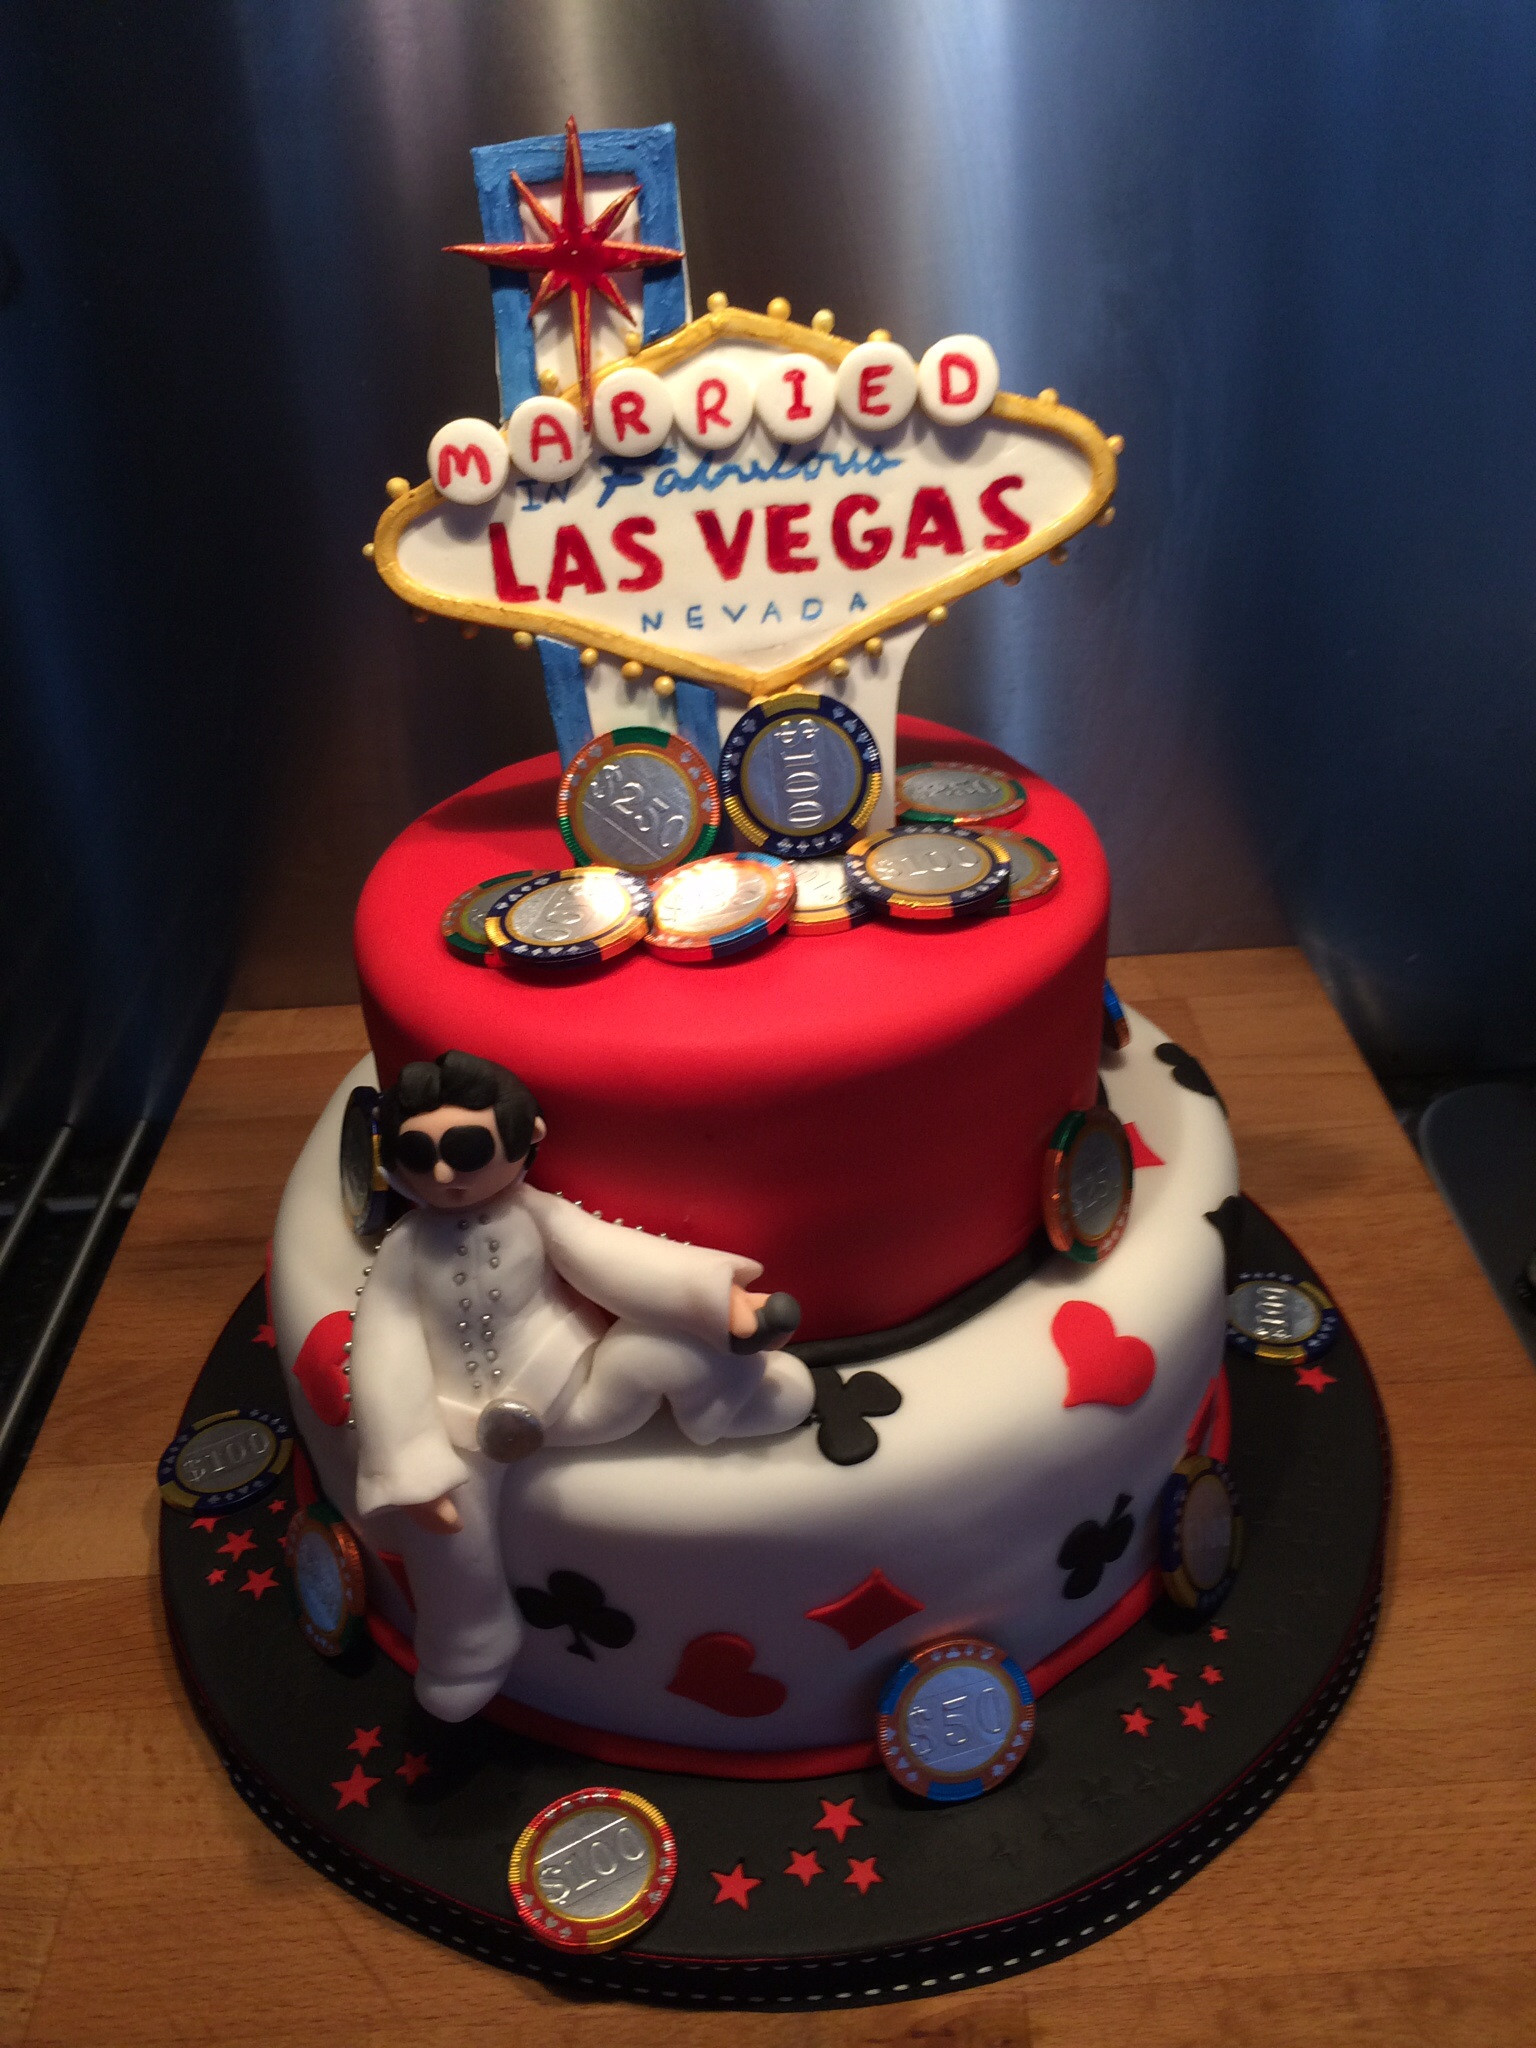 Wedding Cakes Las Vegas  Las vegas wedding cakes idea in 2017